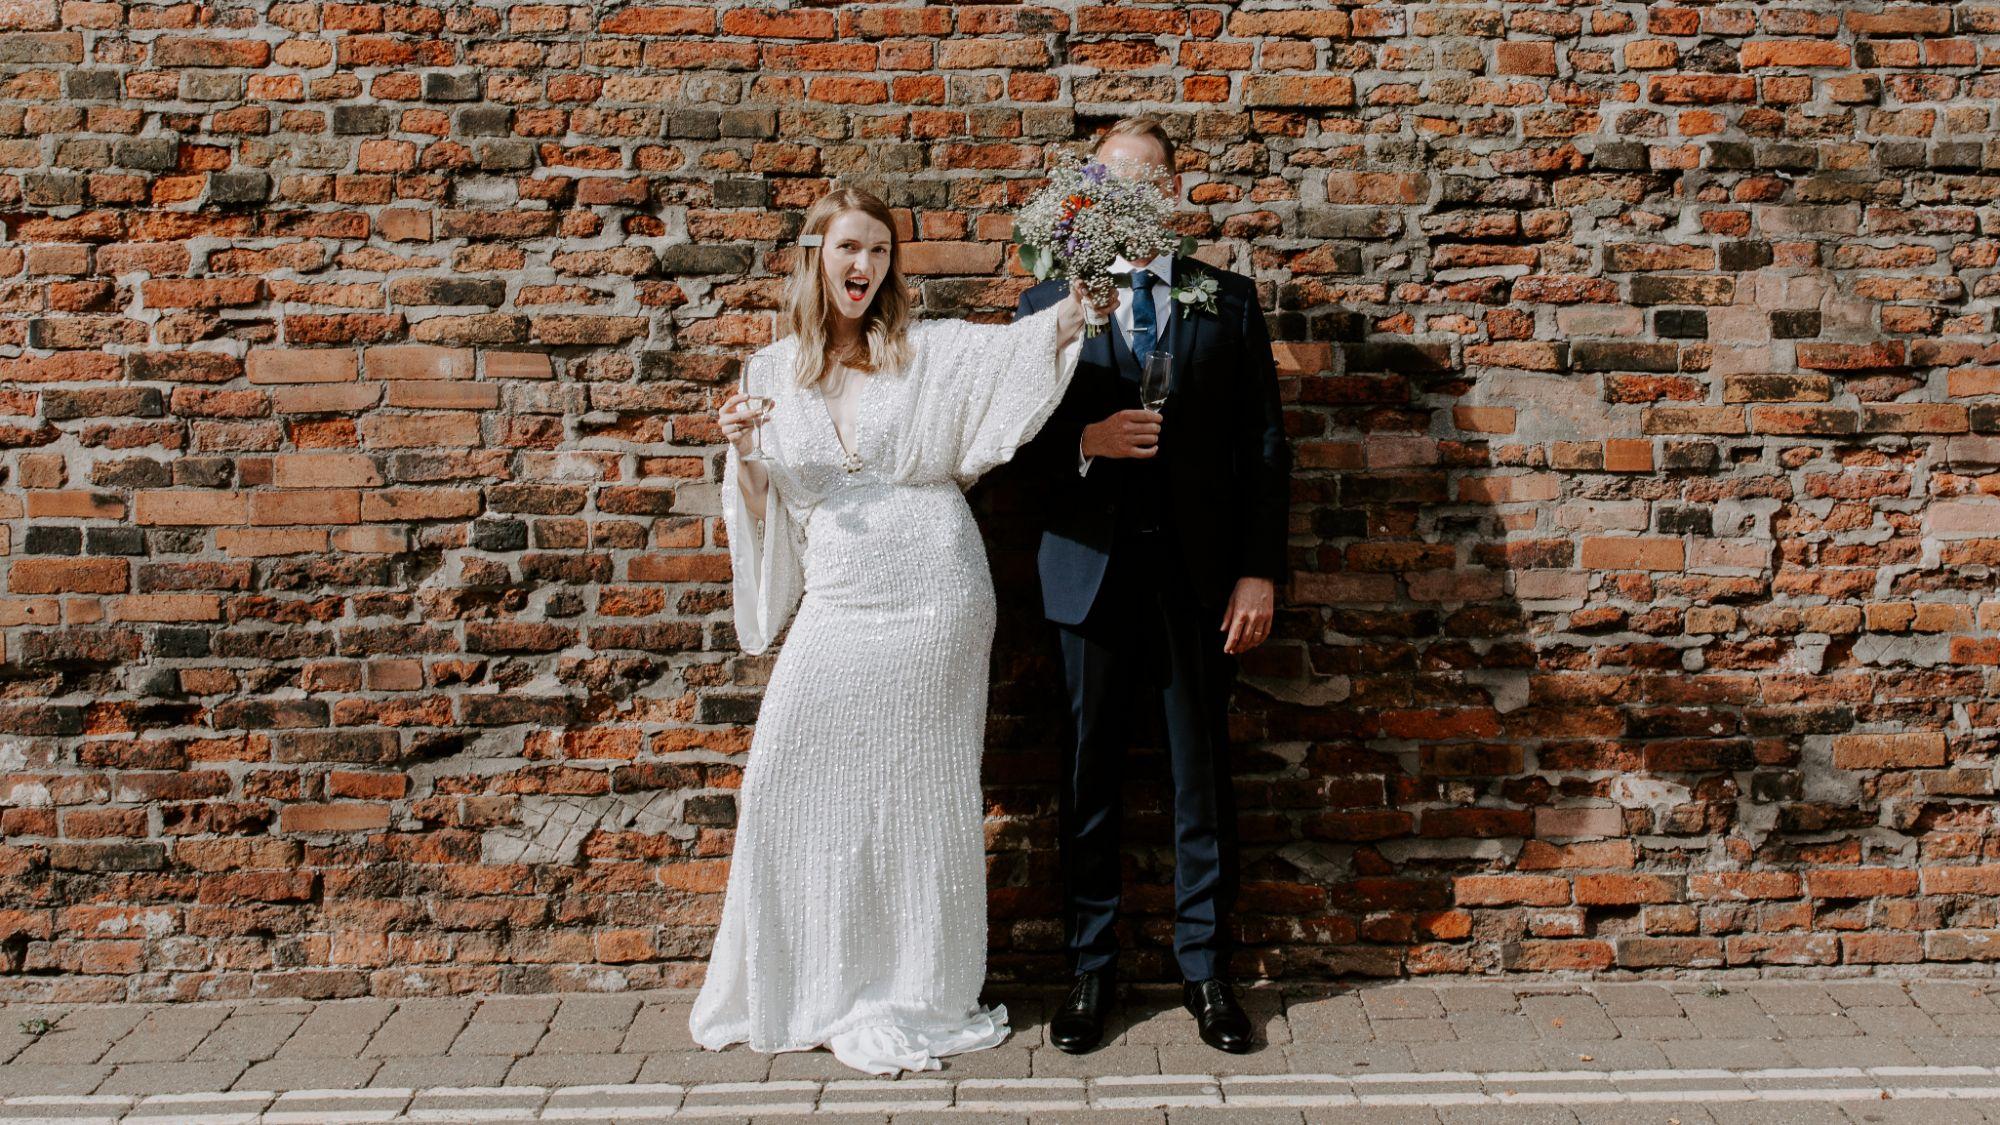 Wedding_Photography_Becky_Tranter-6 (1).jpg